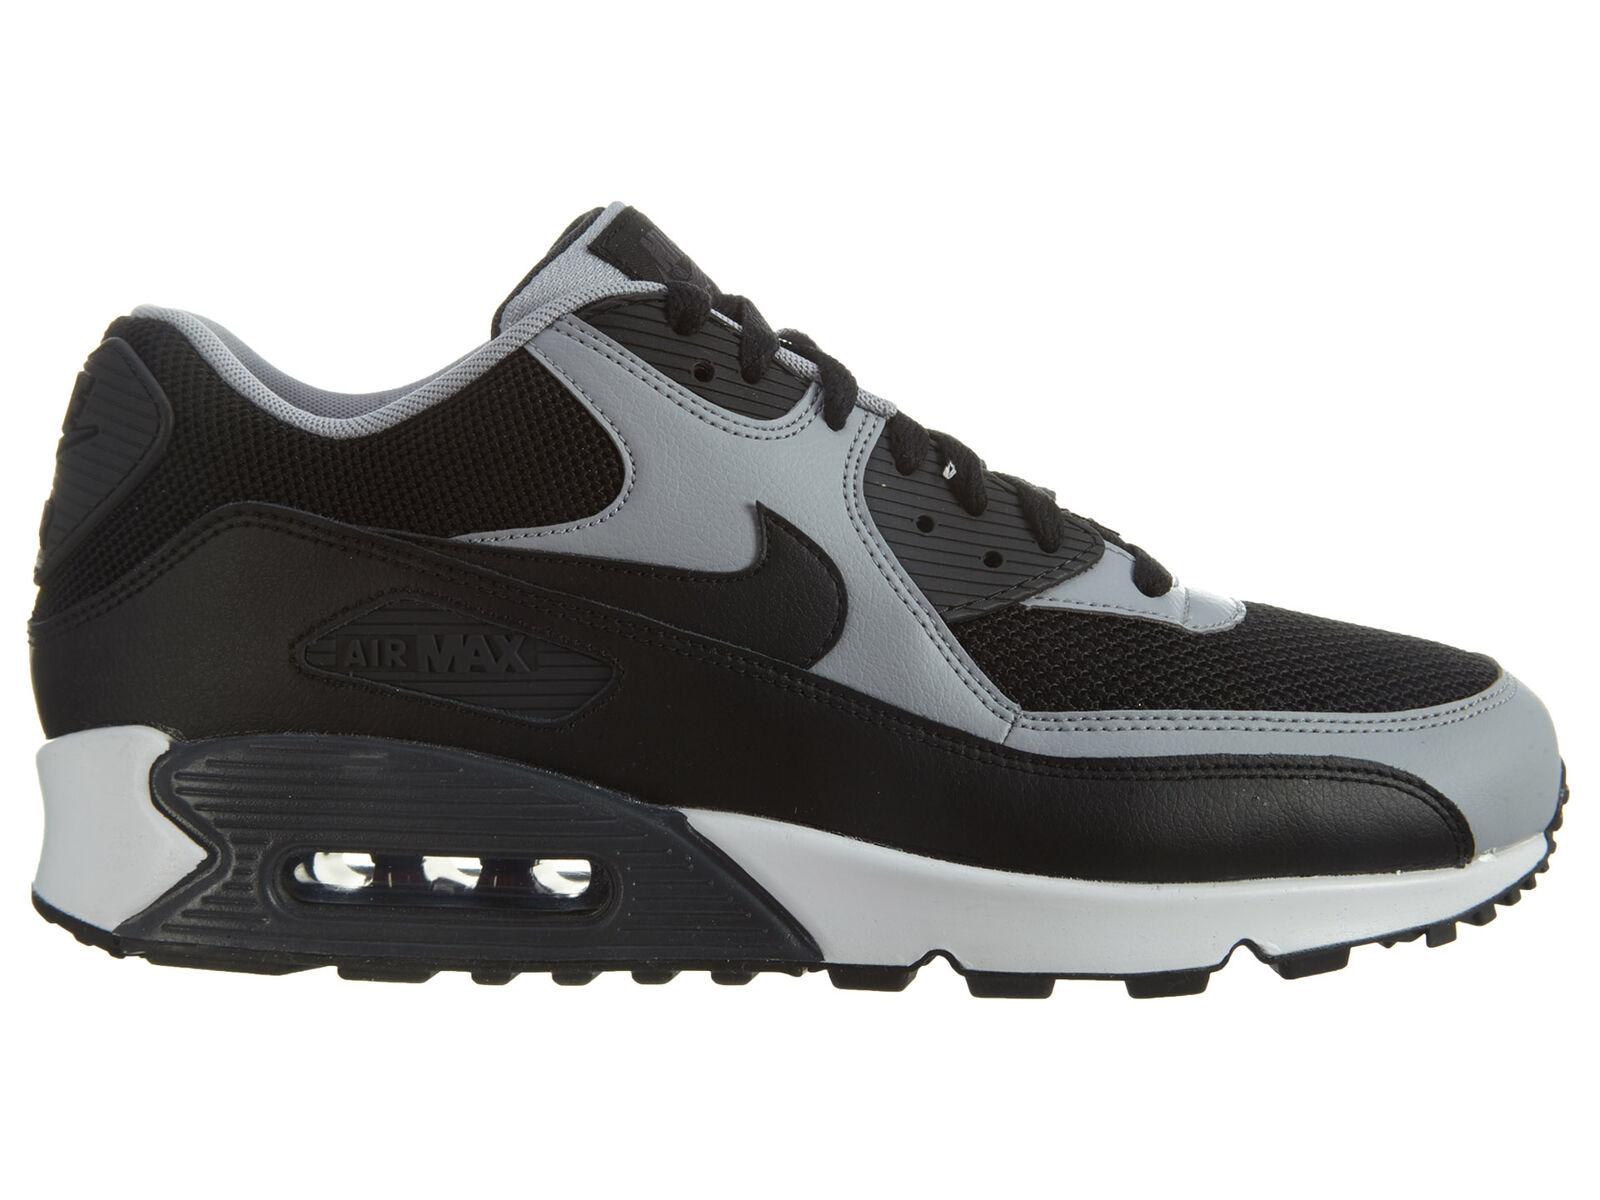 Nike Air Max 90 Essential Mens 537384-053 Black Wolf Grey Running Shoes Comfortable Seasonal clearance sale